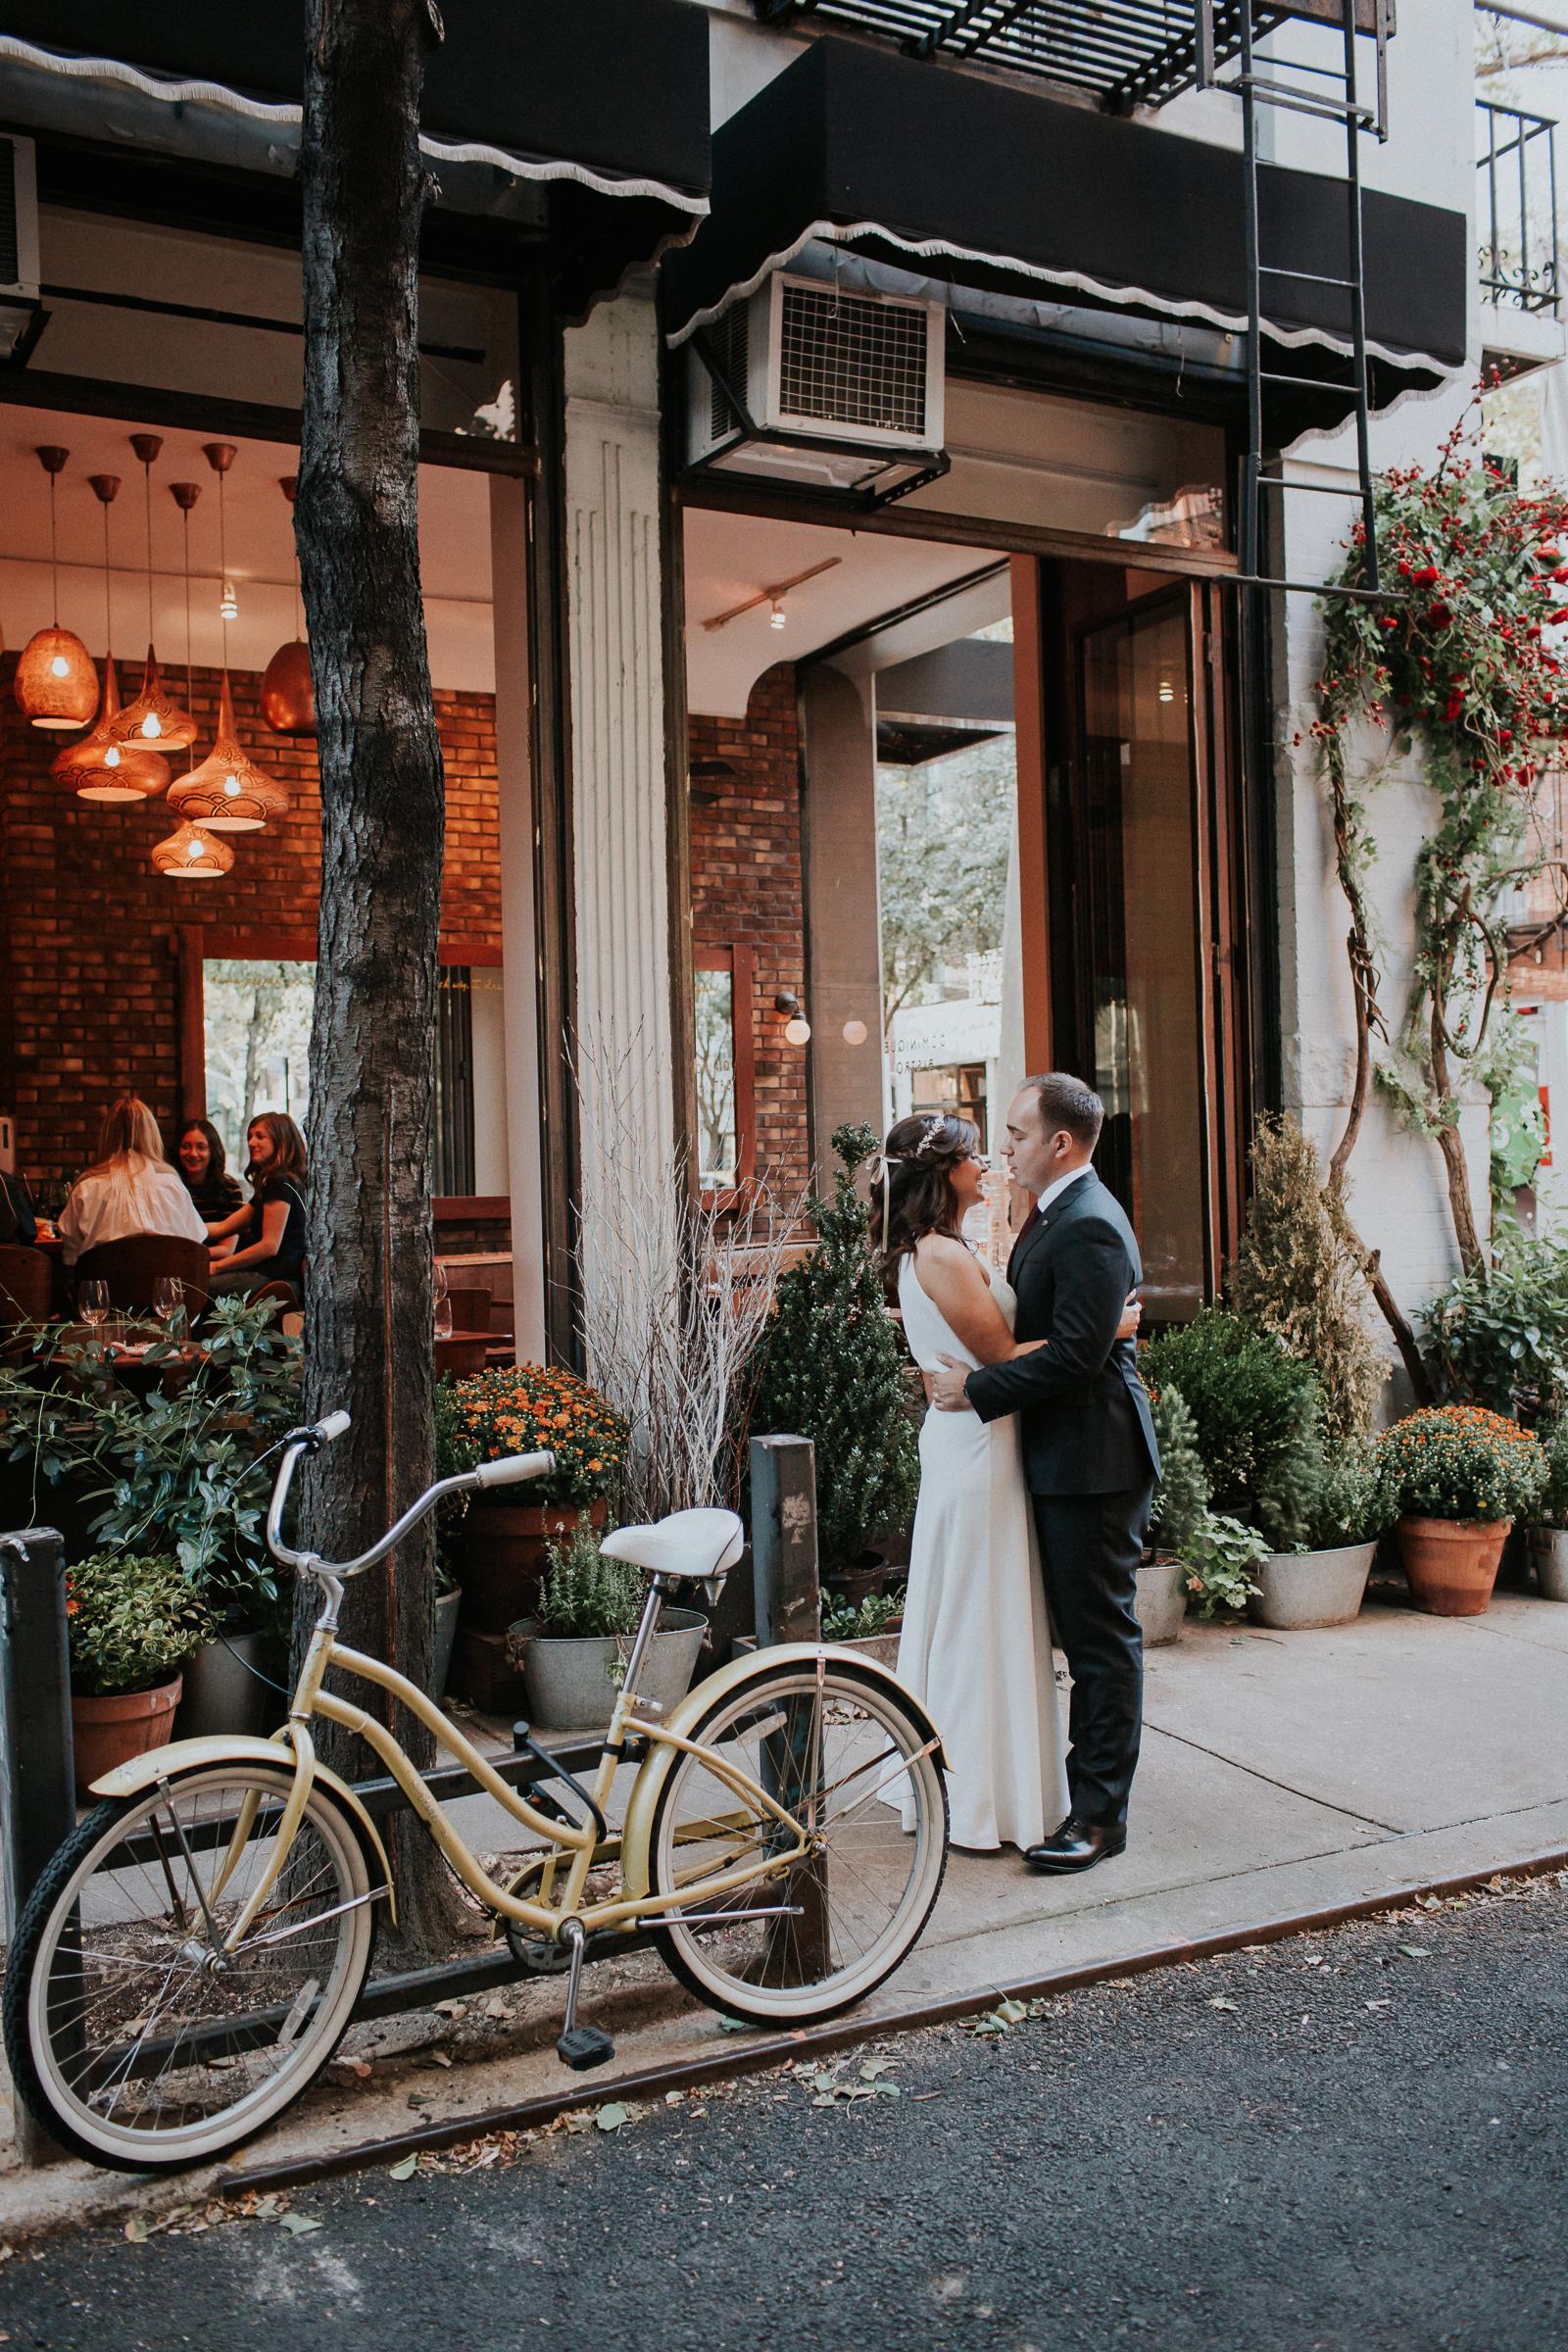 Casa-Apicii-Intimate-Wedding-City-Hall-Elopement-New-York-Documentary-Wedding-Photographer-42.jpg